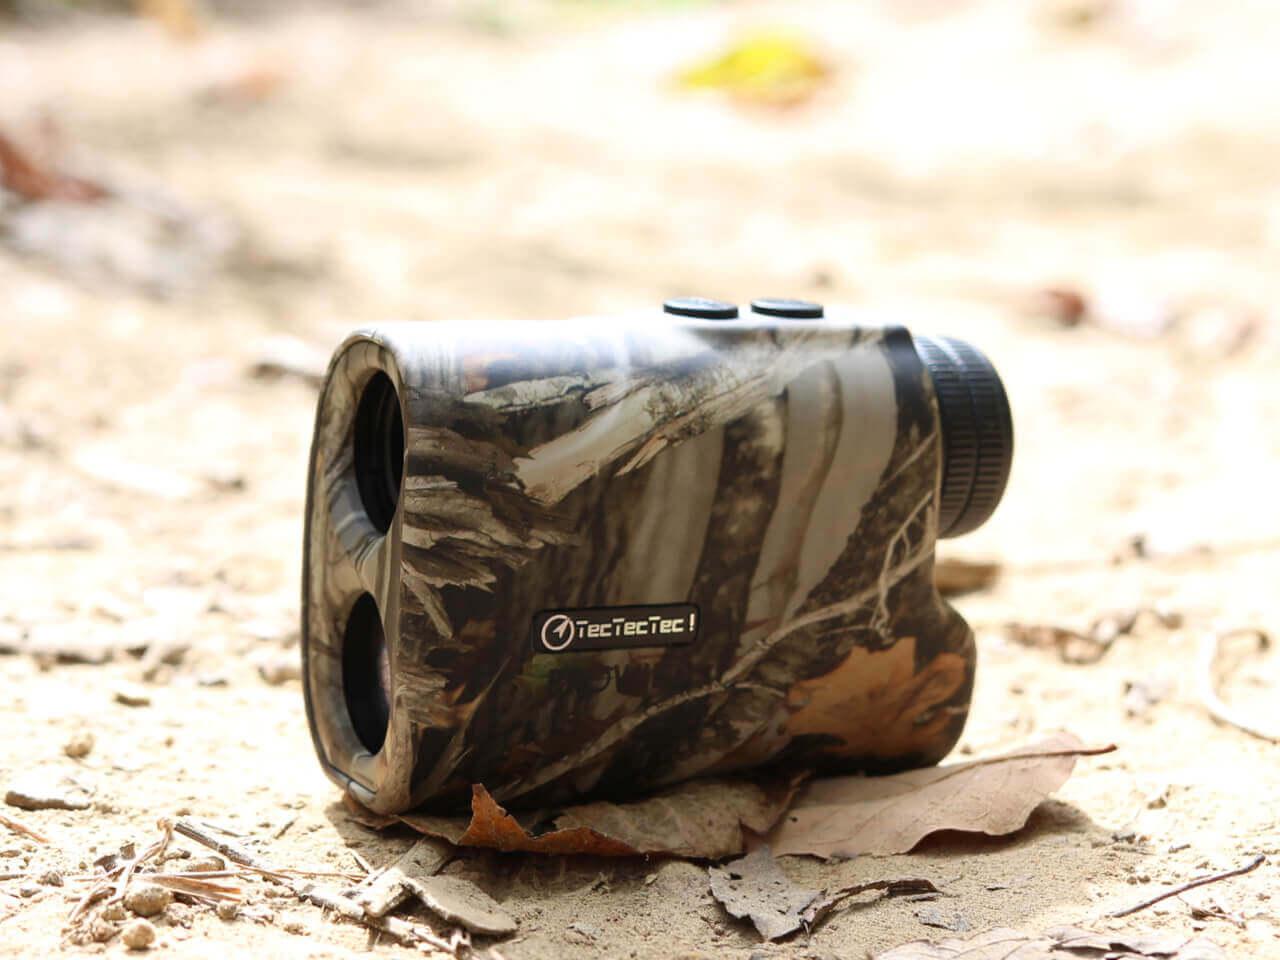 TecTecTec Hunting Rangefinder Prowild Advanced speed technology